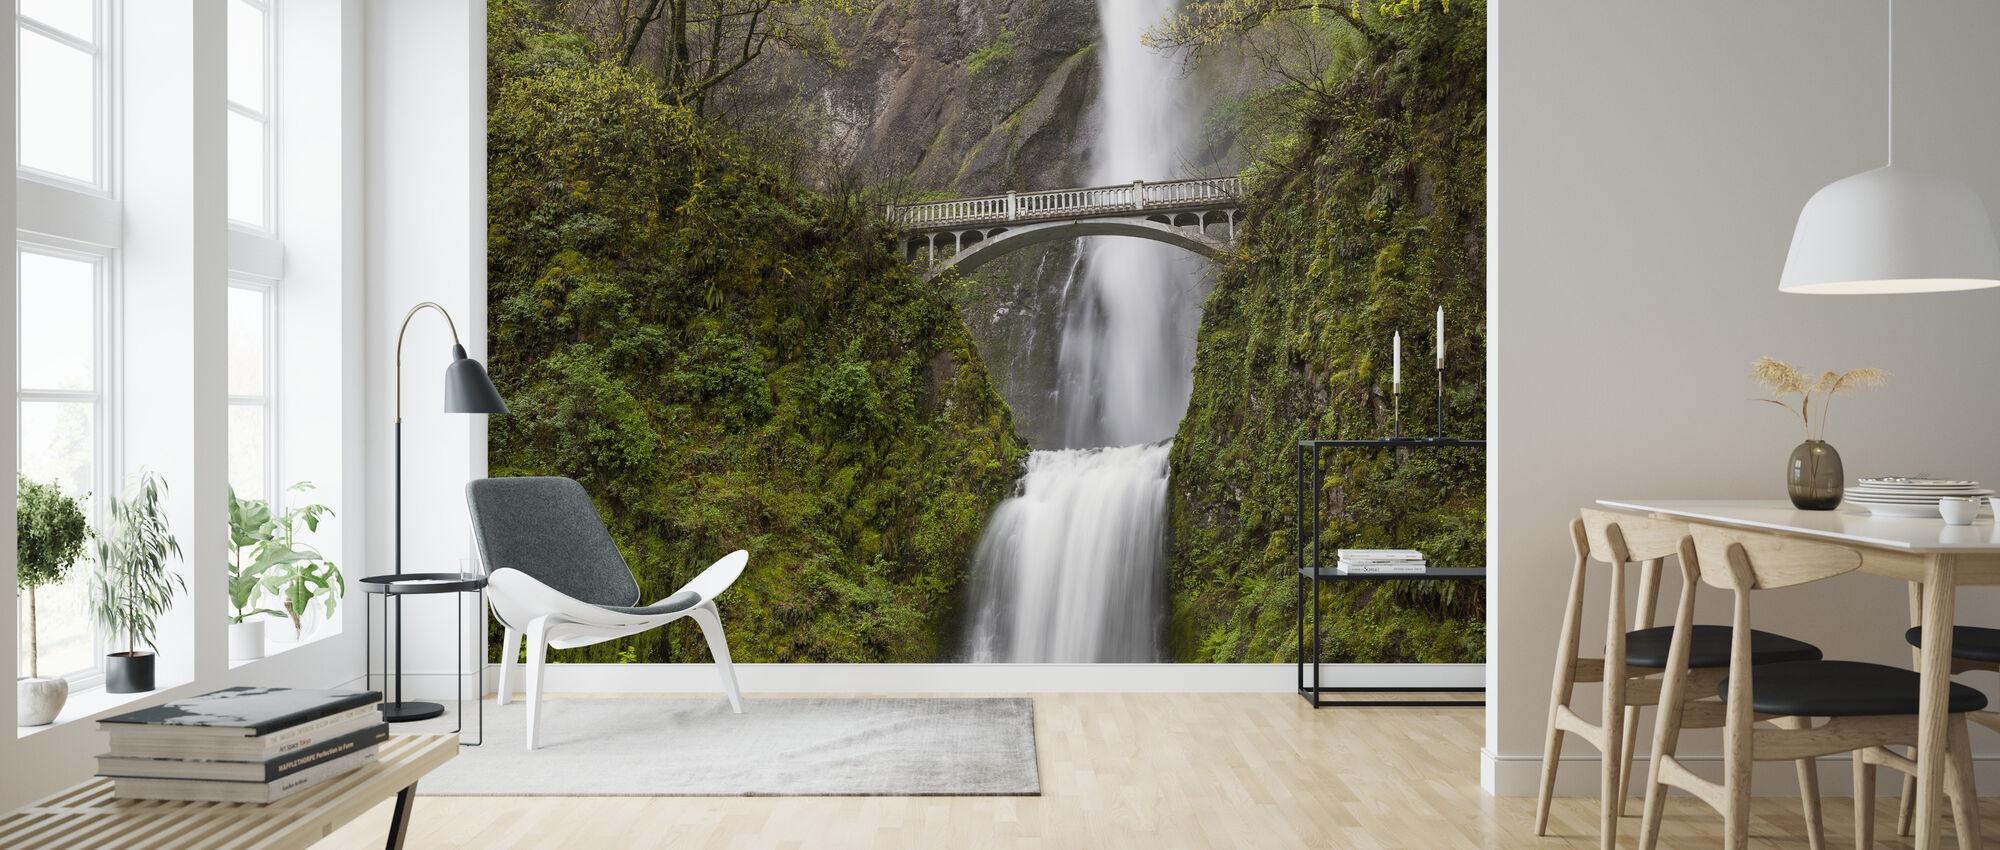 Multnomah Falls - Wallpaper - Living Room